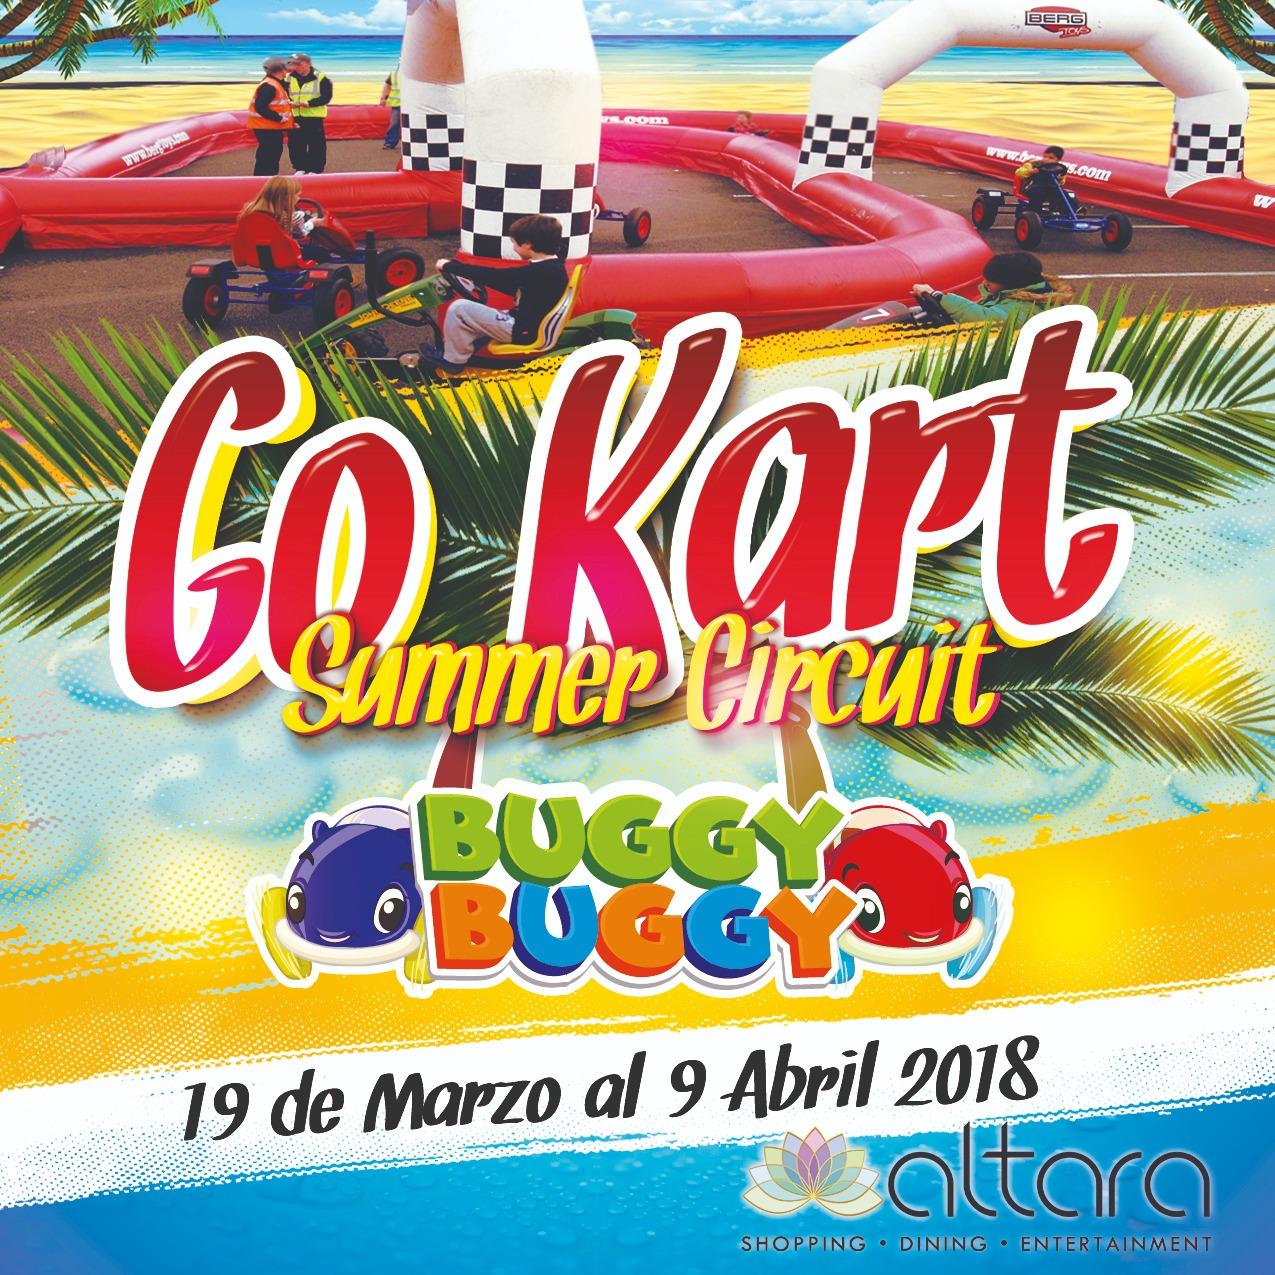 Go Kart Summer Circuit